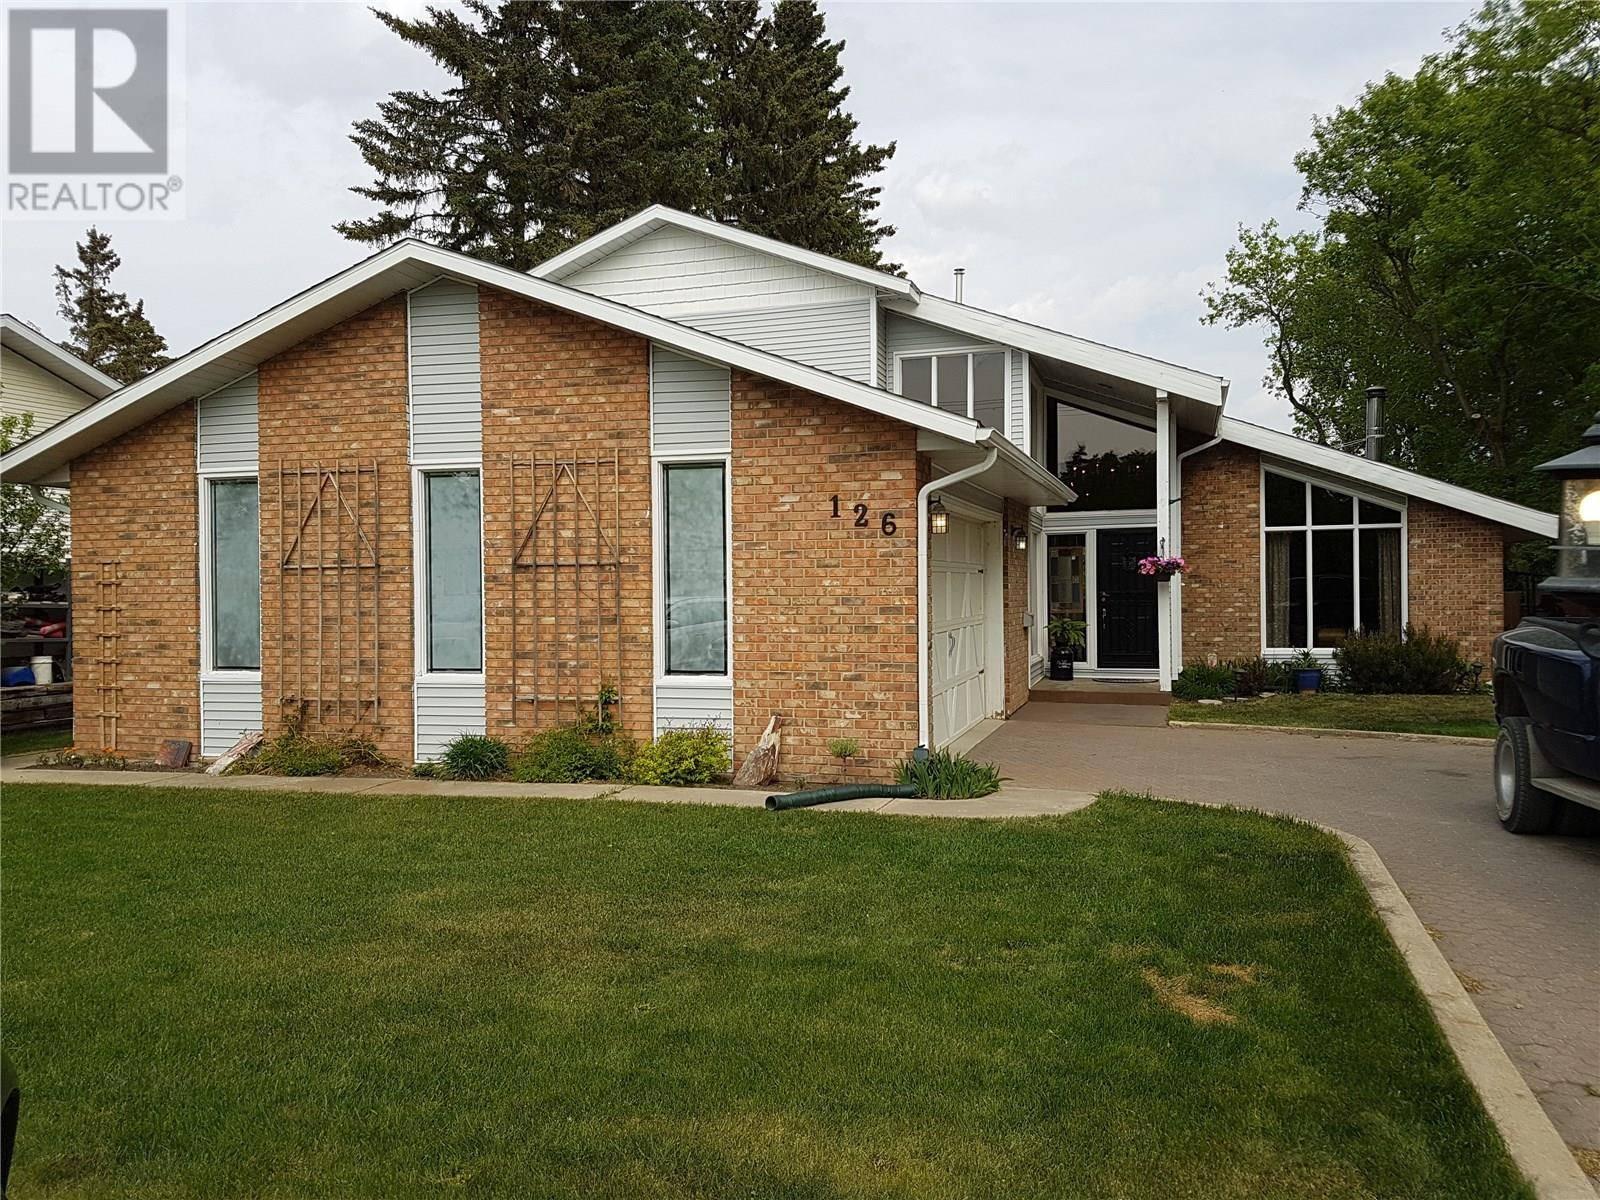 House for sale at 126 1st St Dalmeny Saskatchewan - MLS: SK774334